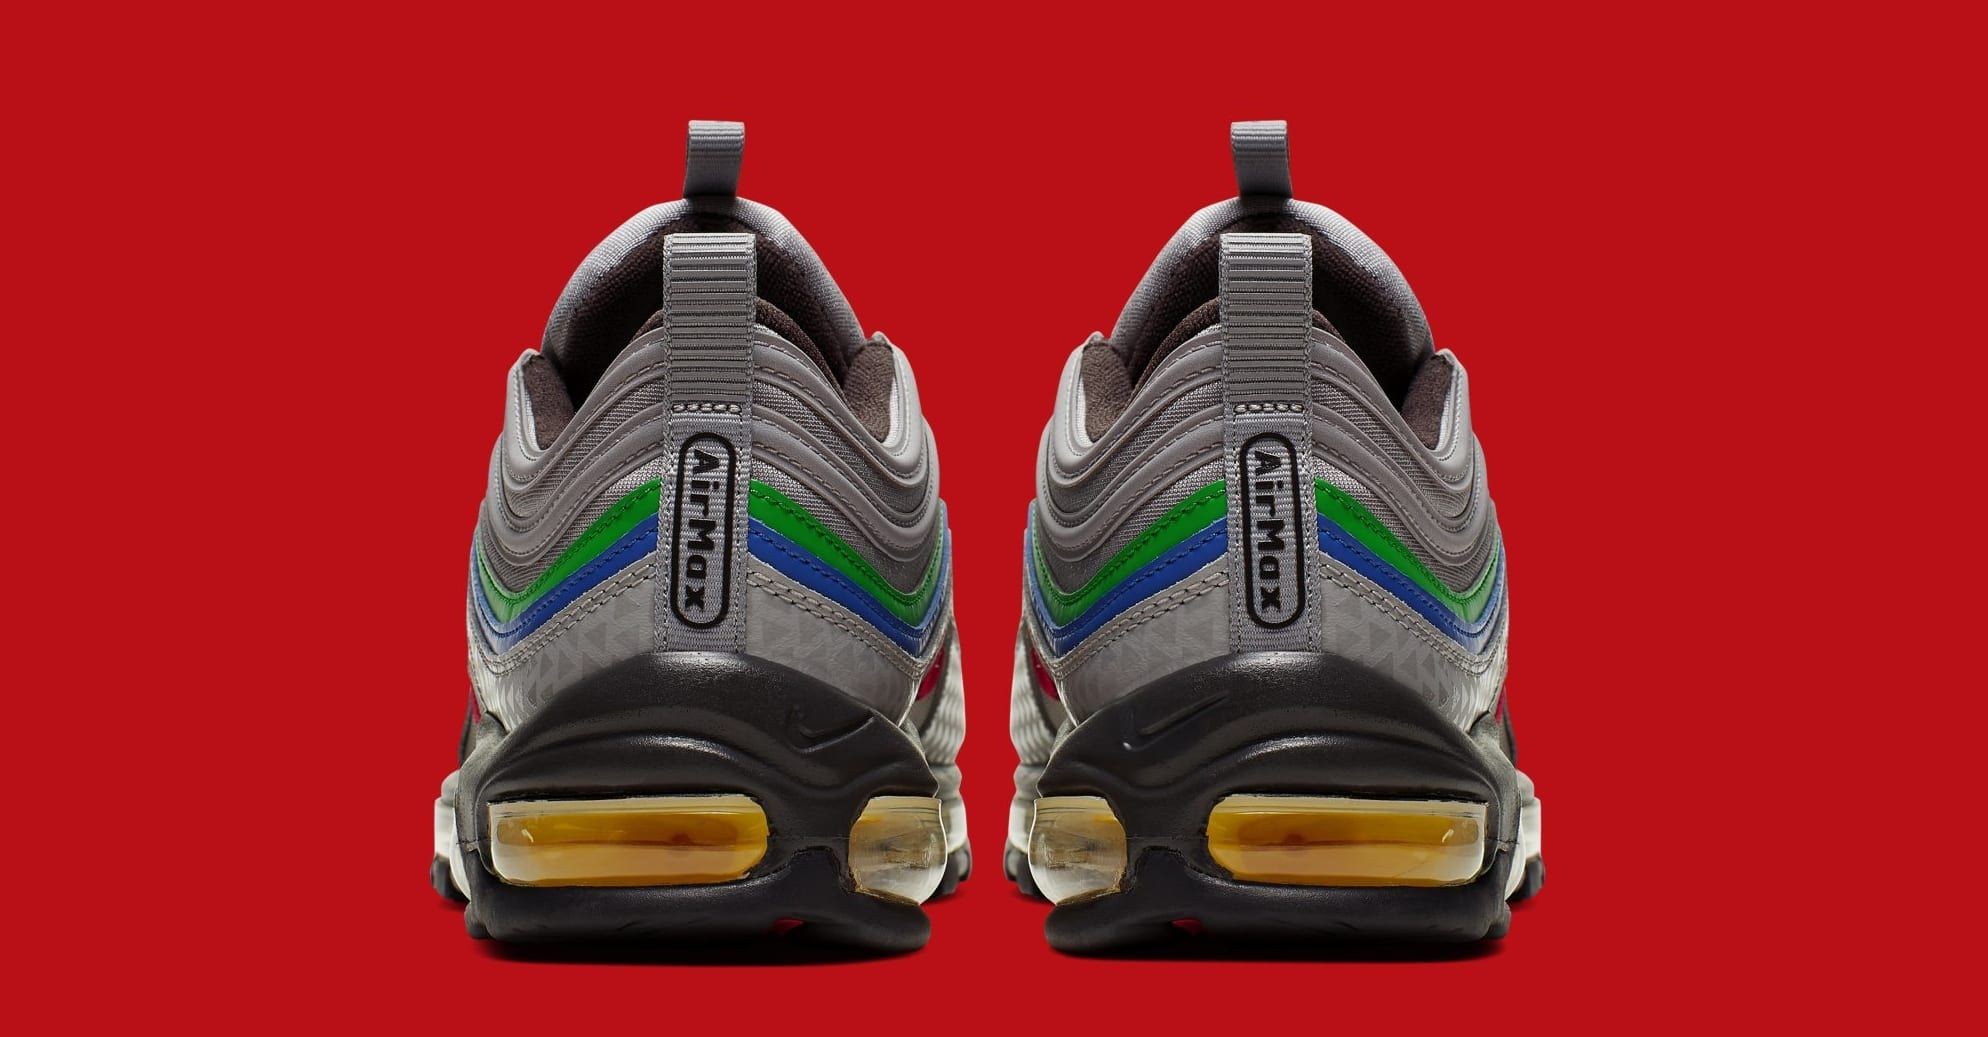 Nike Air Max 97 'Nintendo 64' CI5012